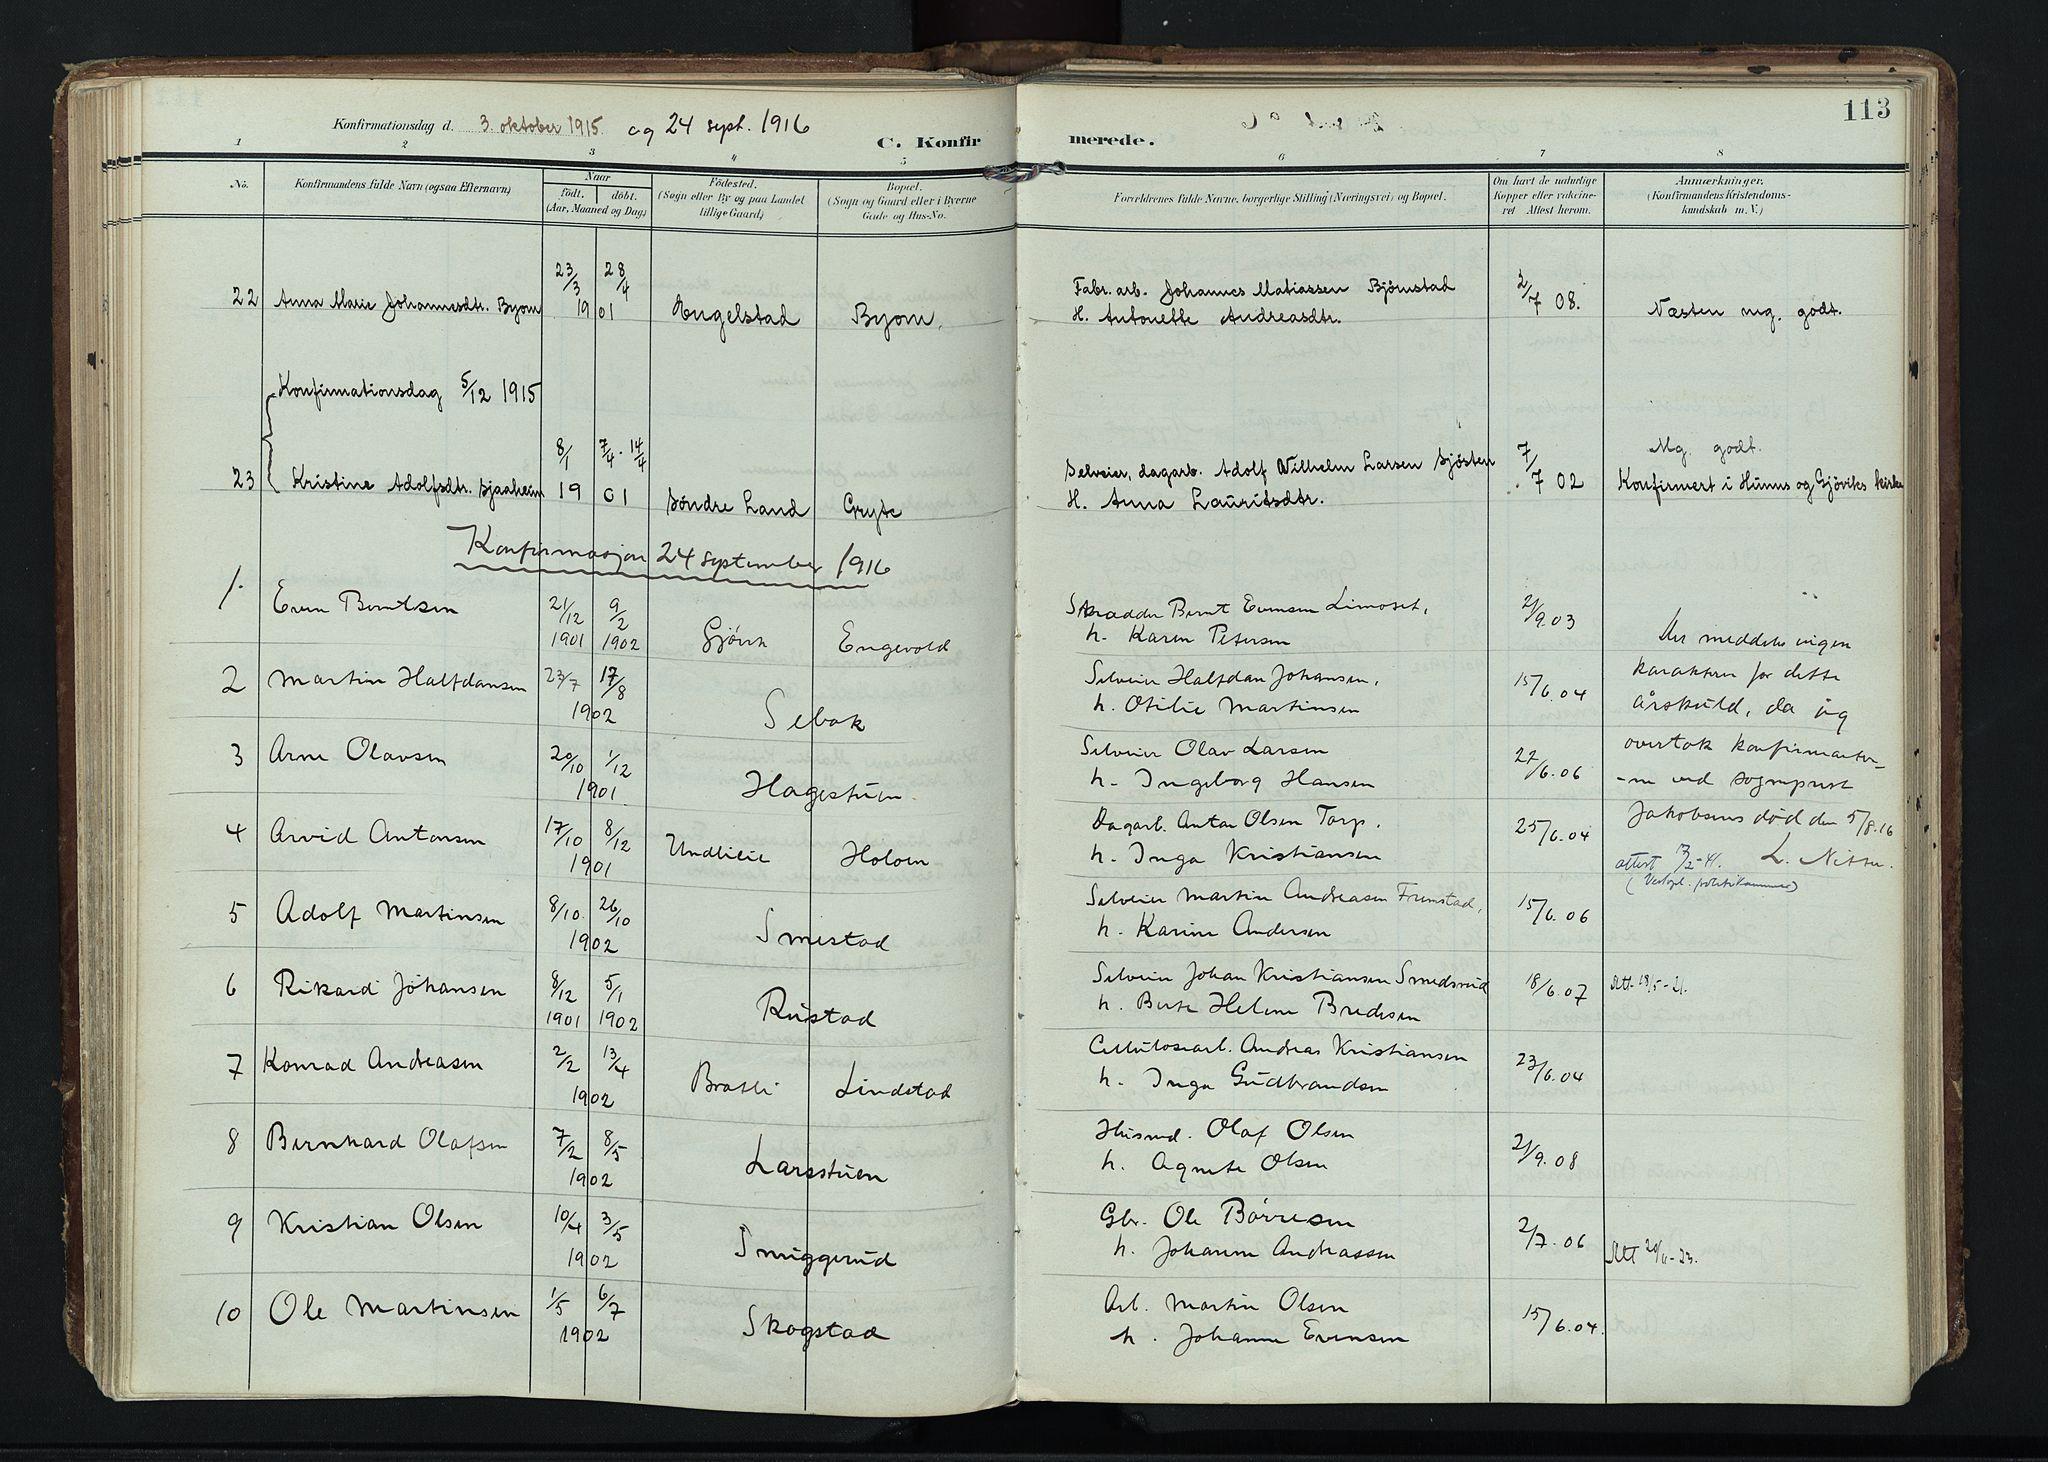 SAH, Vardal prestekontor, H/Ha/Haa/L0020: Ministerialbok nr. 20, 1907-1921, s. 113